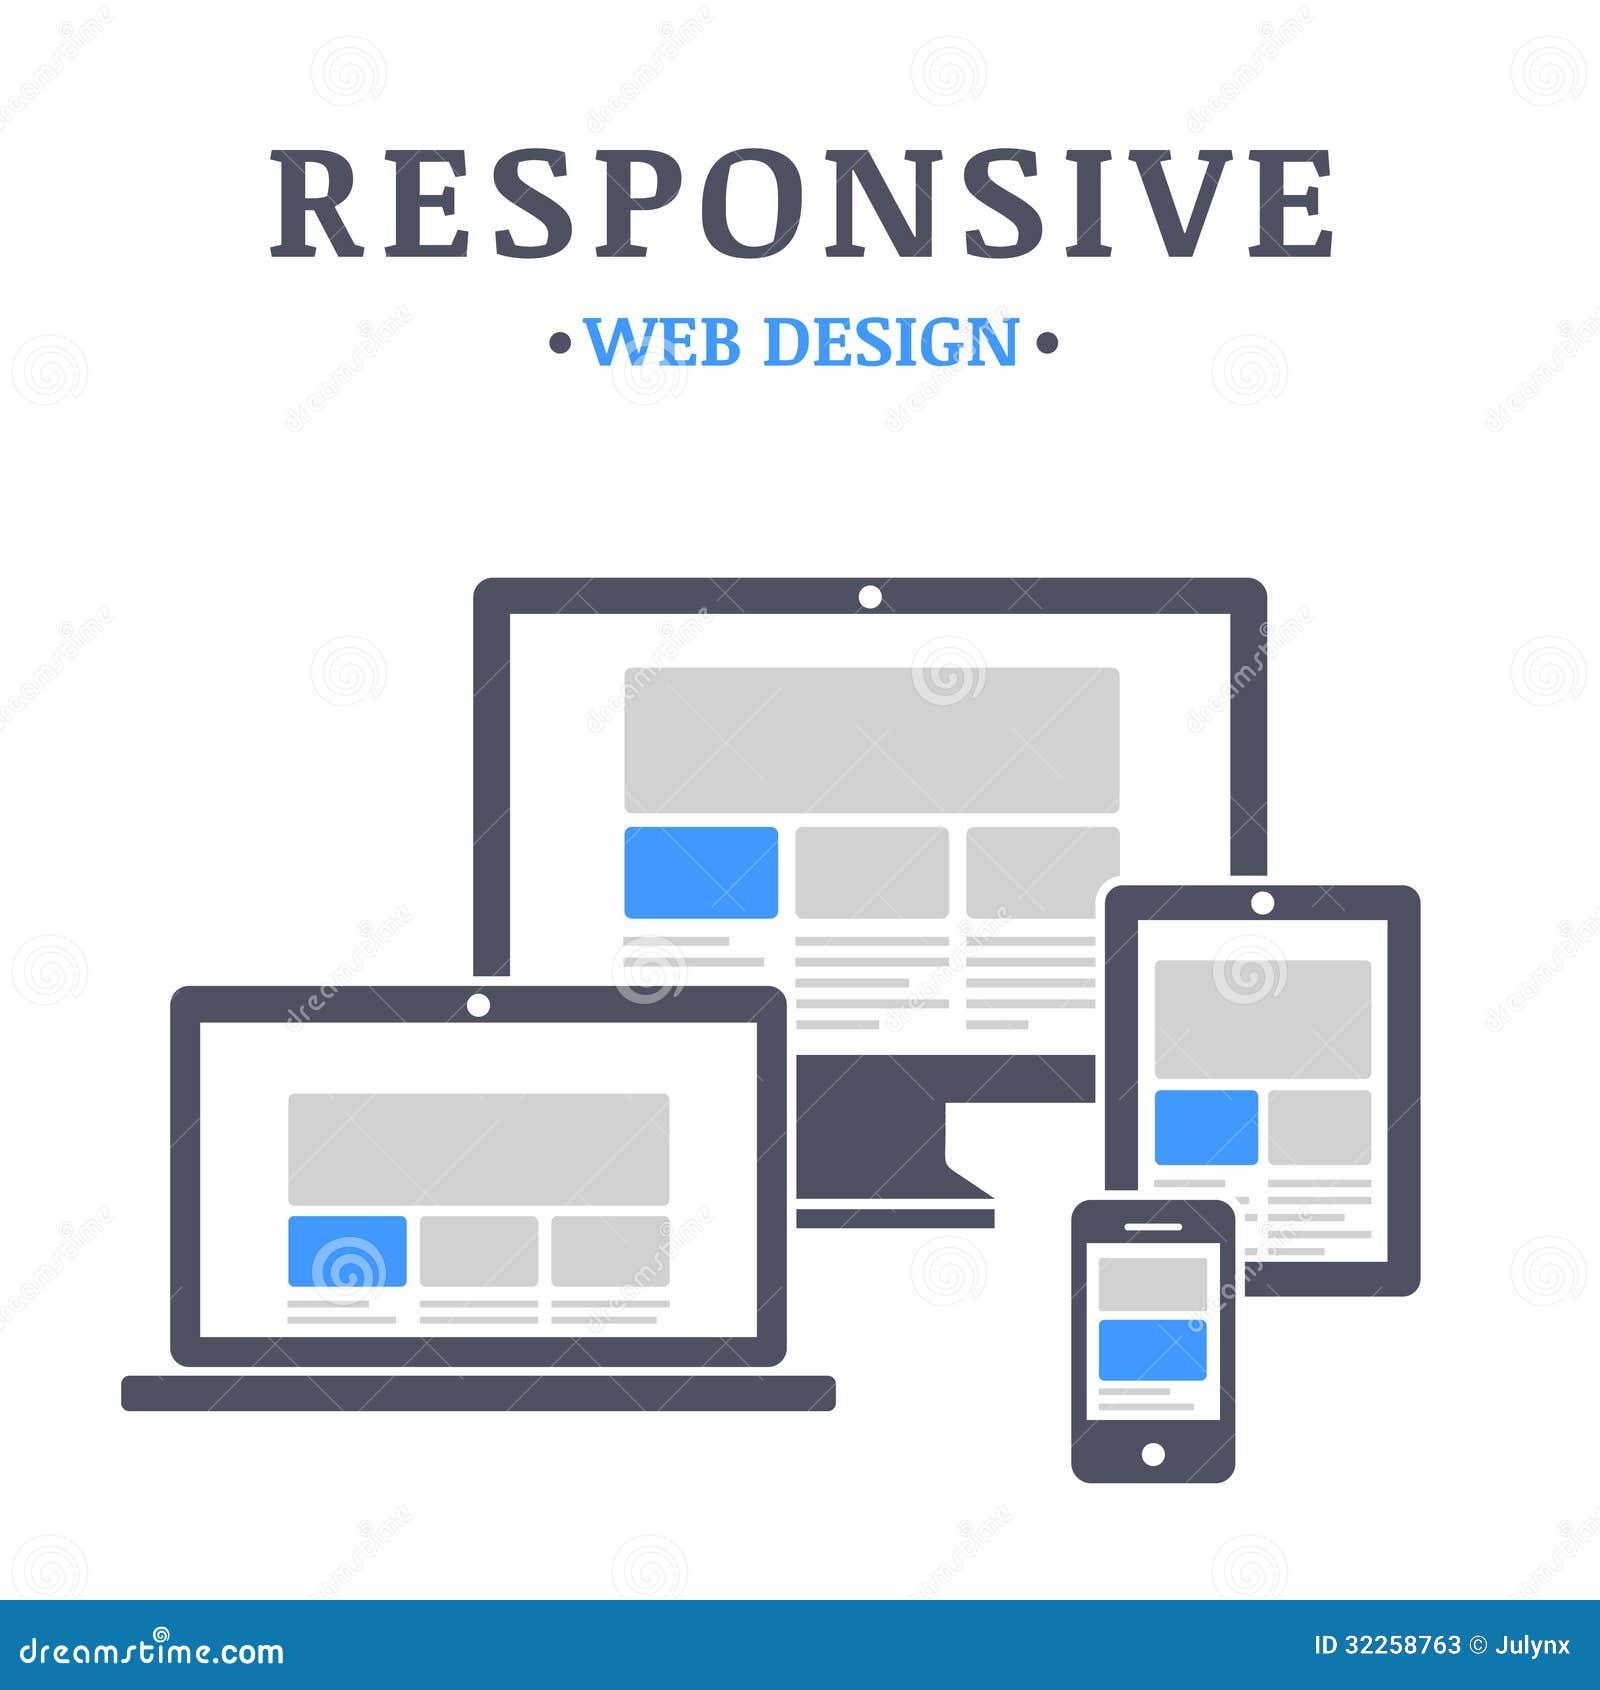 Responsive Web Design Stock Photos - Image: 32258763: www.dreamstime.com/stock-photos-responsive-web-design-different...